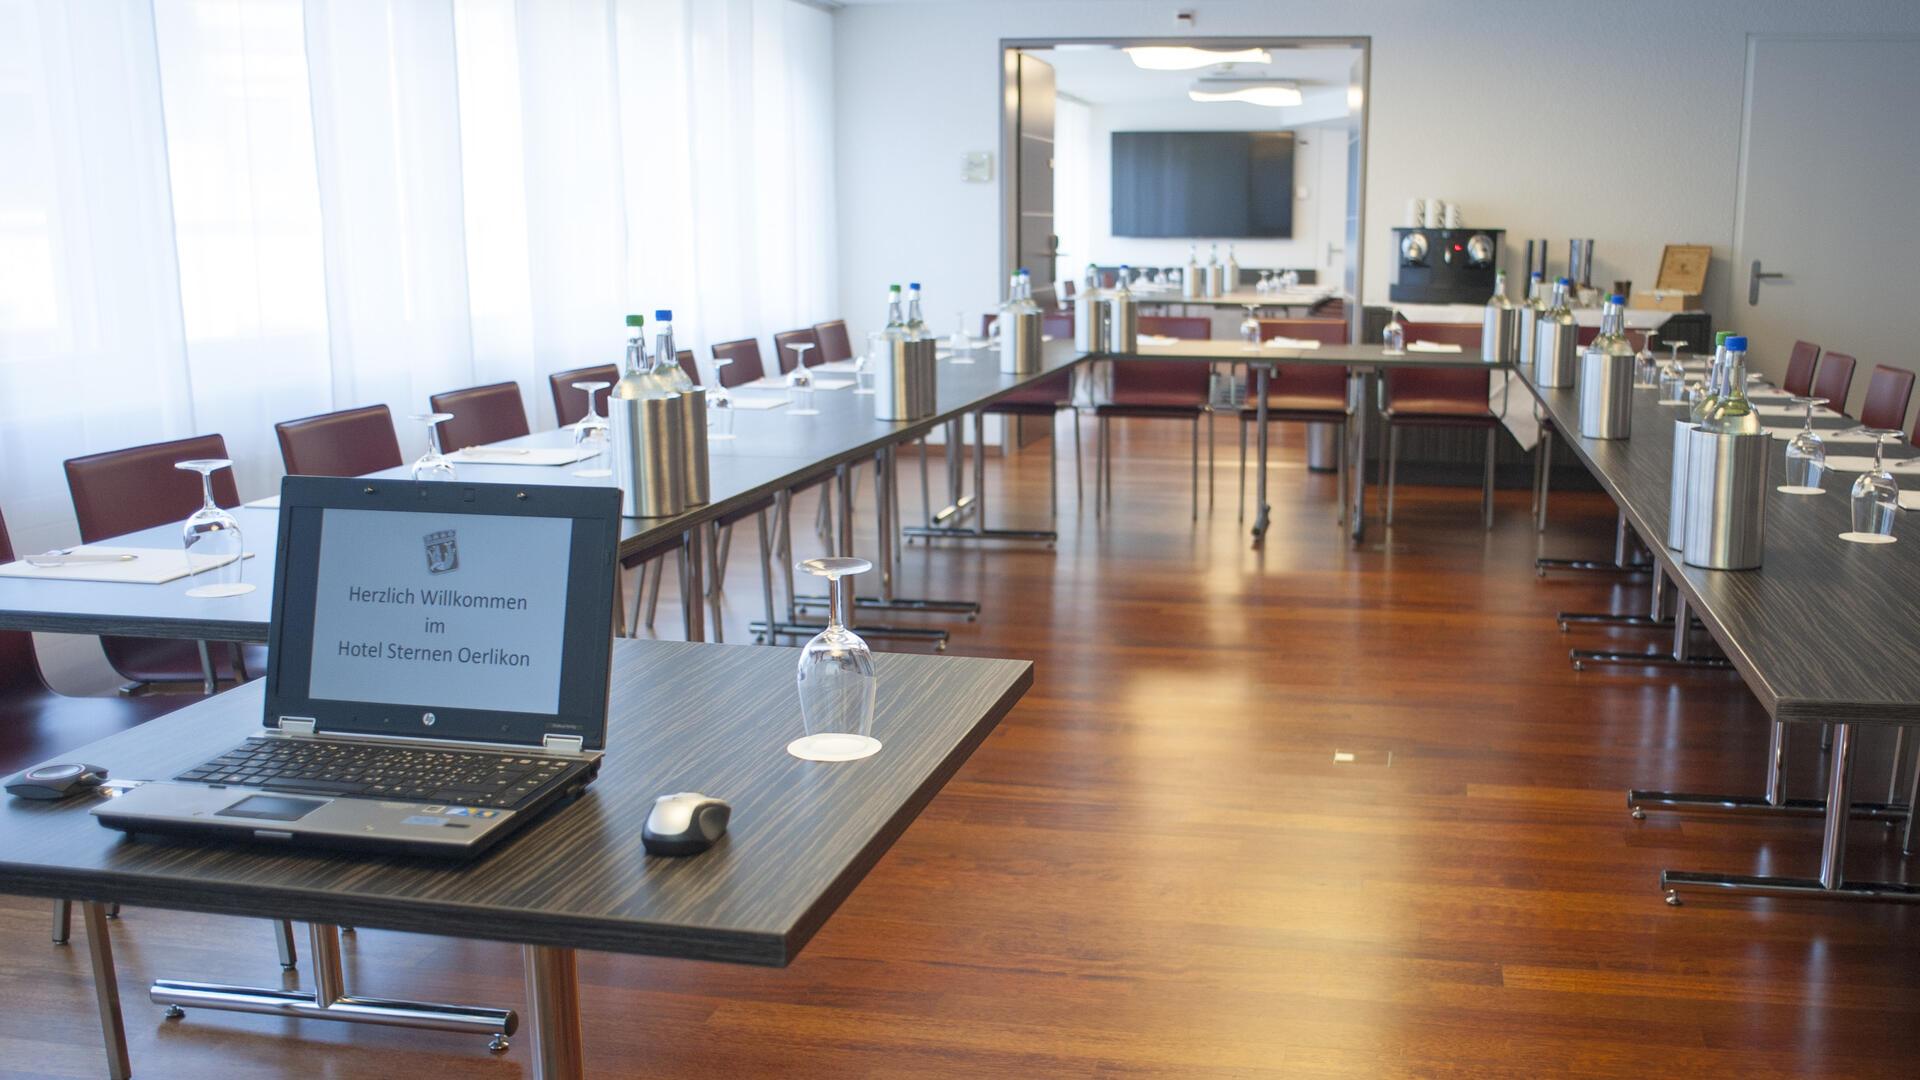 Seminar Room at Hotel Sternen Oerlikon in Zurich